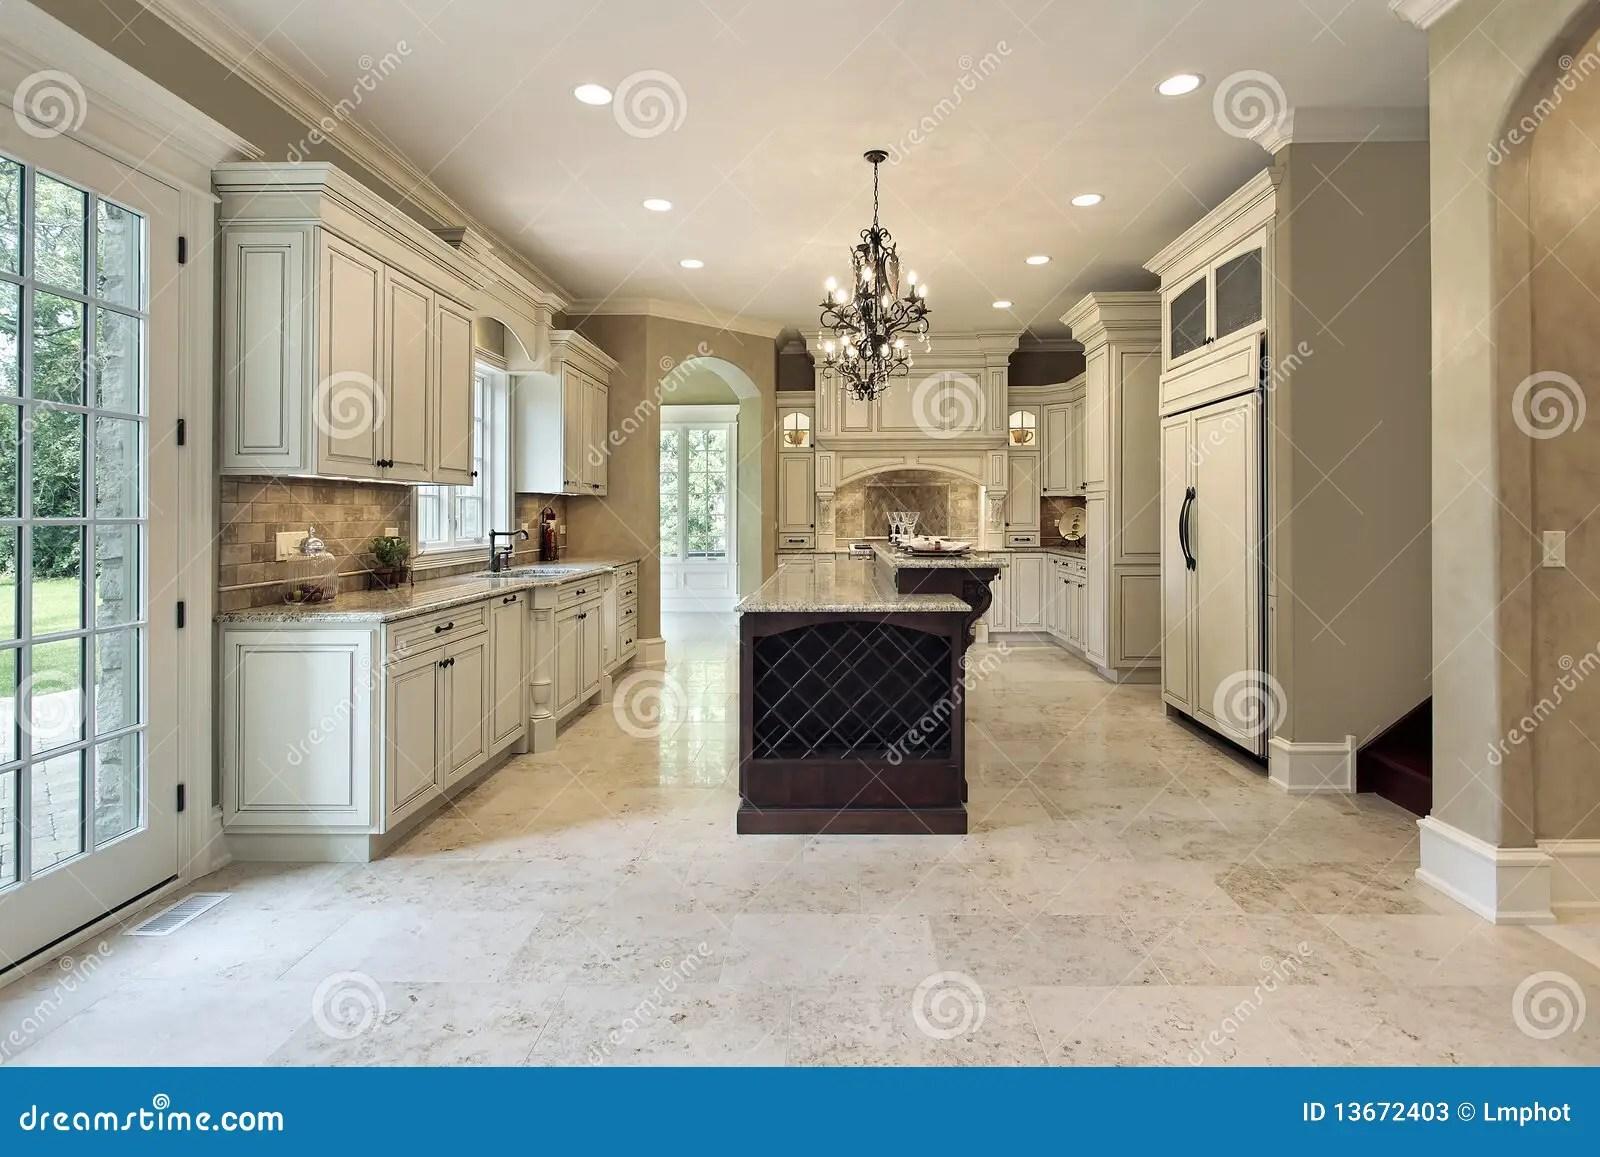 kitchen island lighting fixtures glass backsplash with double deck stock photos - image: 13672403